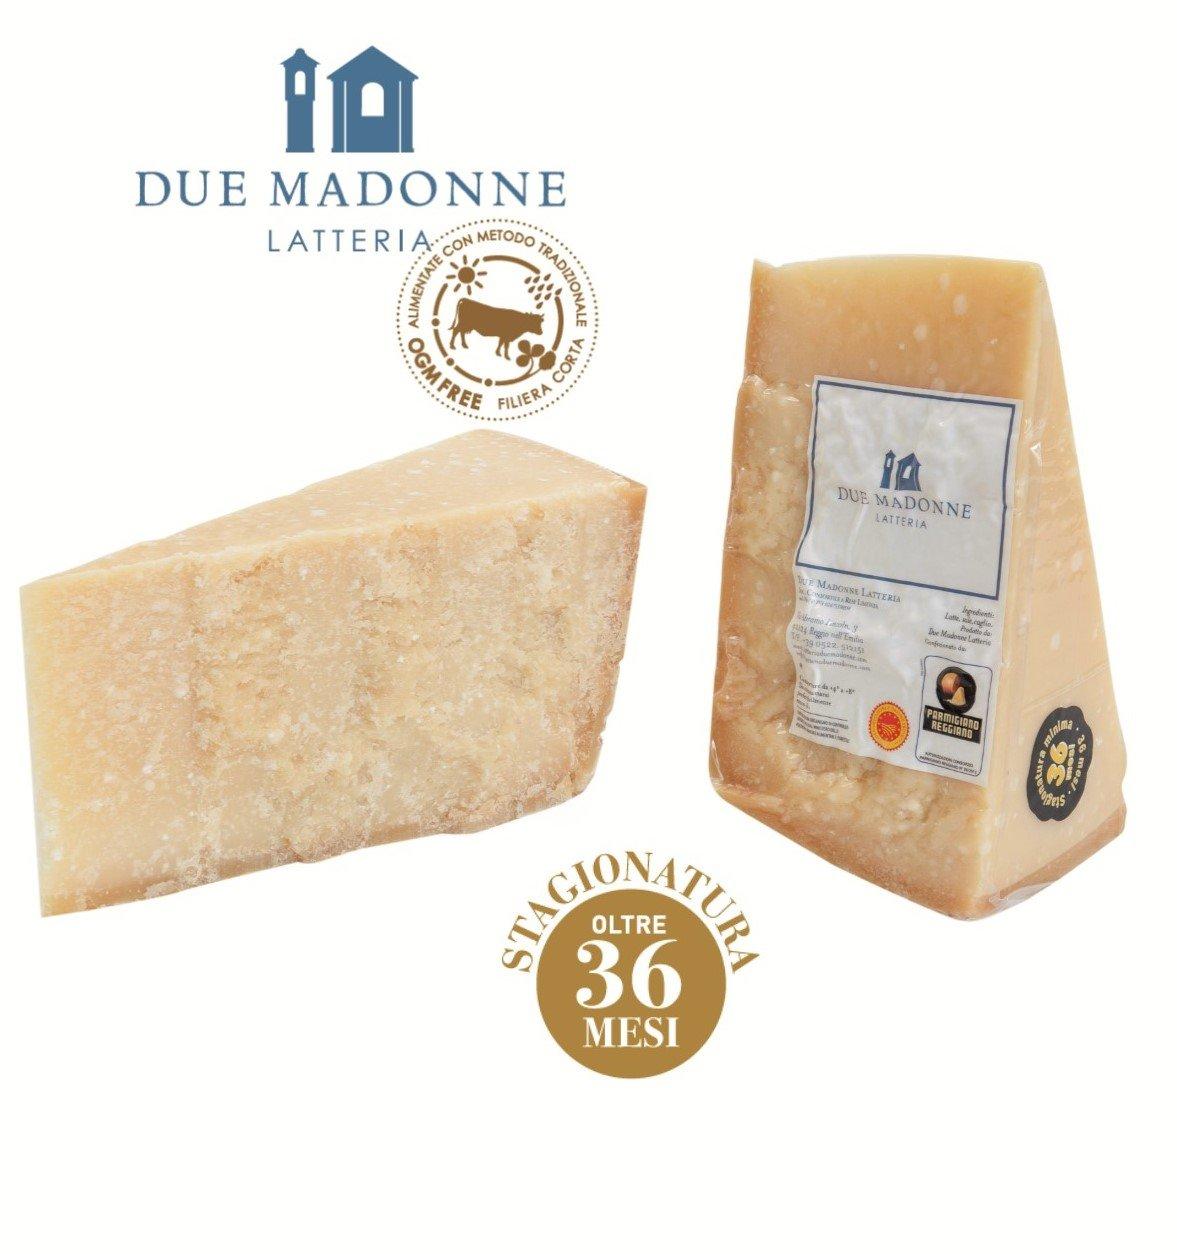 Parmigiano Reggiano 36 Monate 1 kg.: Amazon.de: Lebensmittel & Getränke